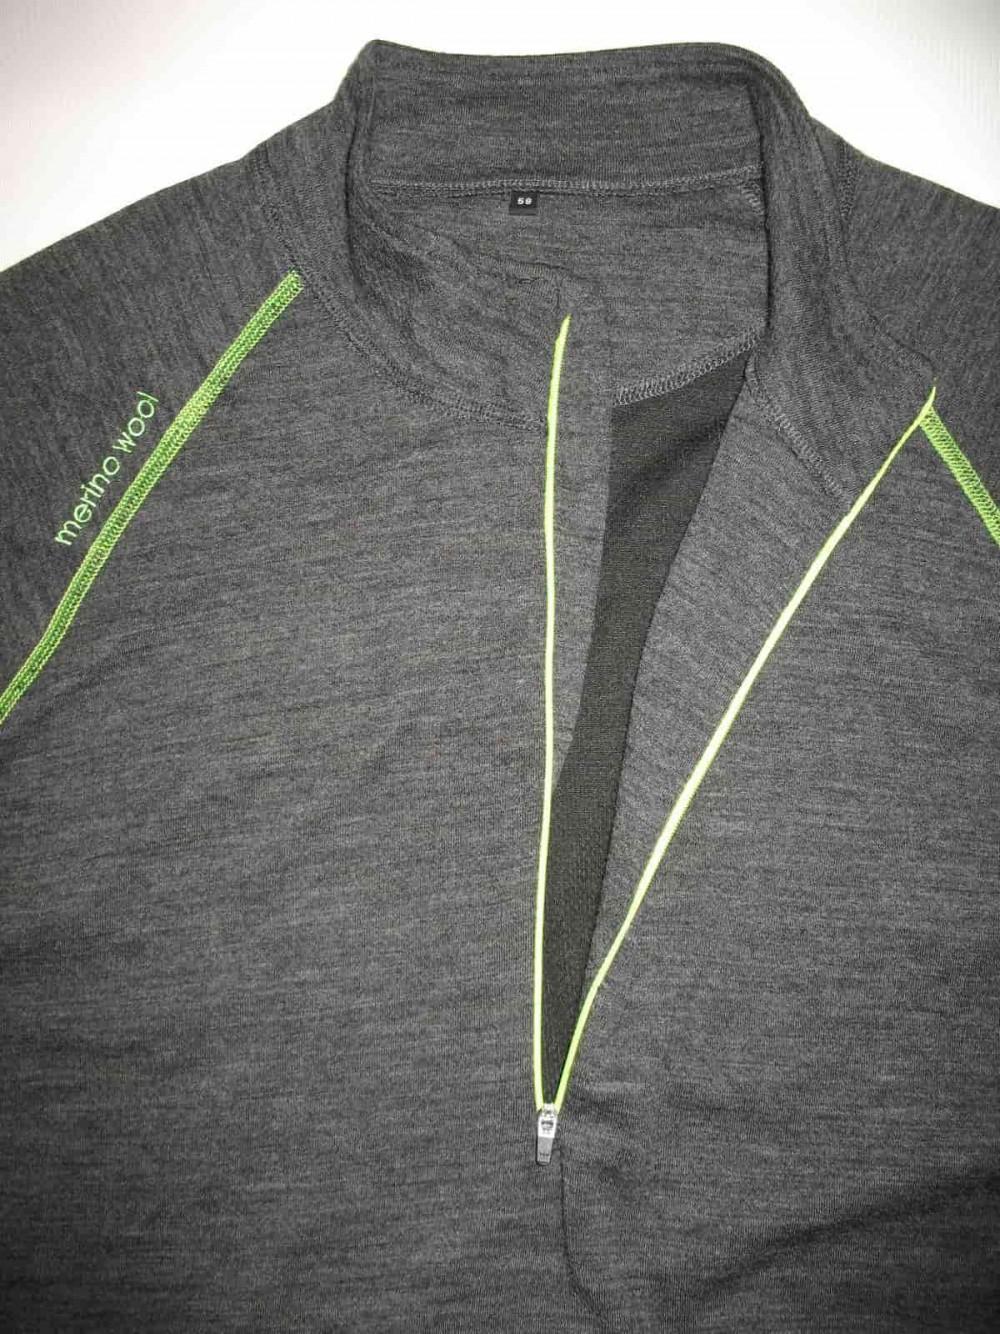 Термобелье MAUL merino jersey (размер 58-XXL) - 2